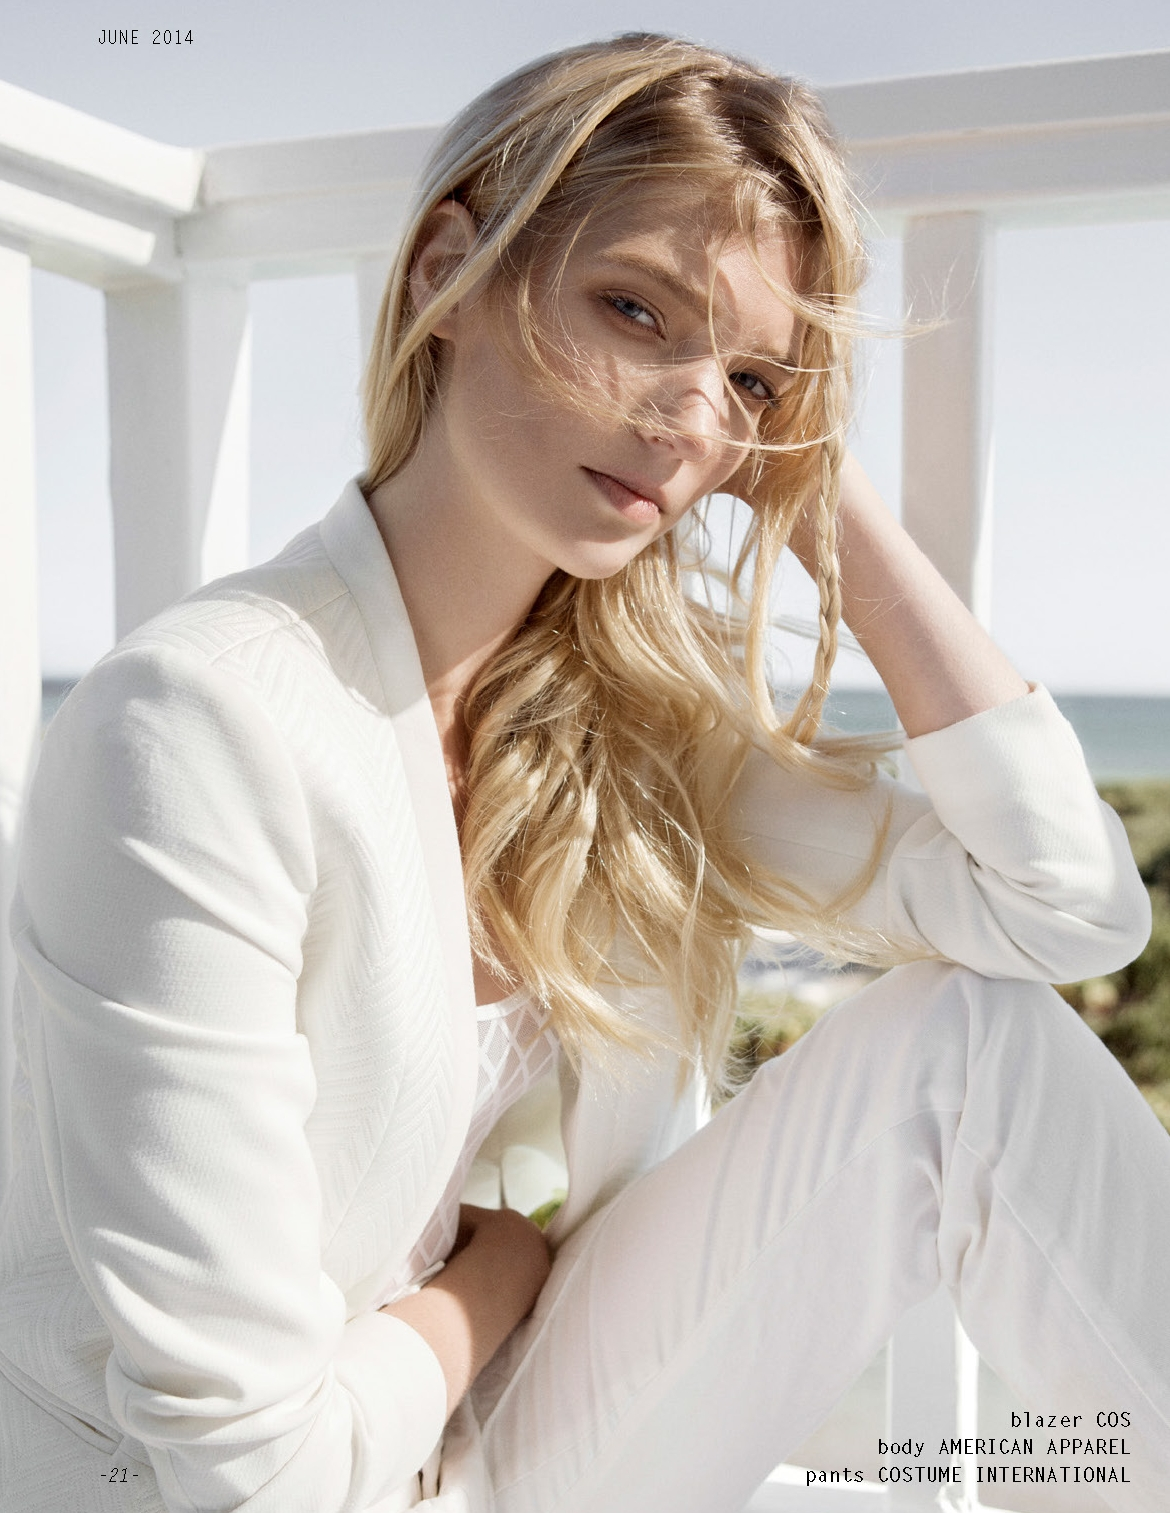 AMANDA LEEMIS